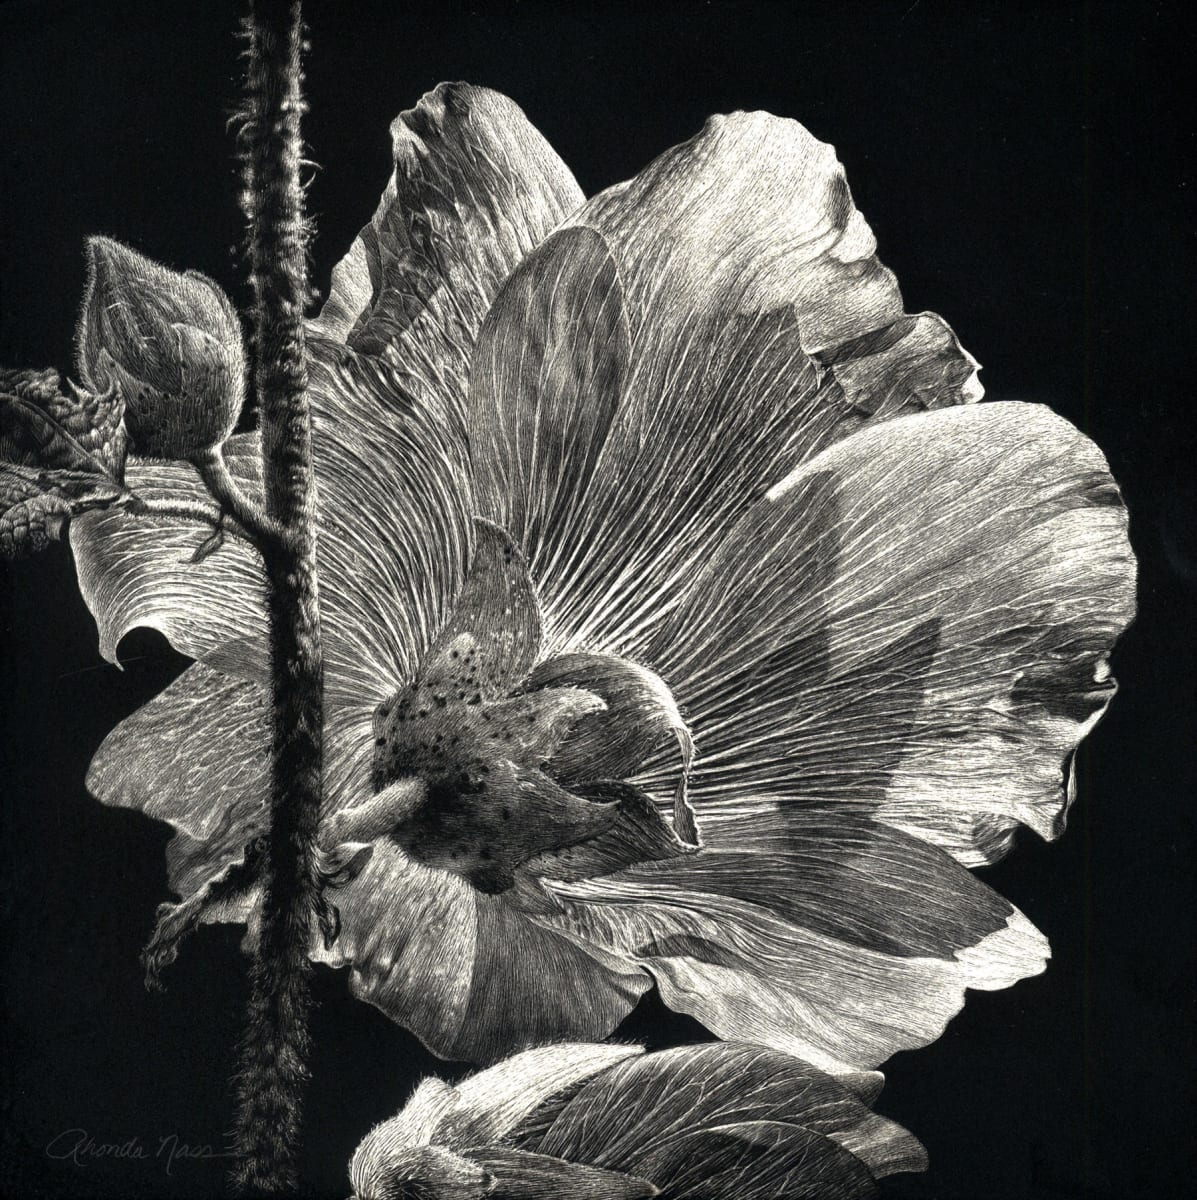 Another Perspective: Hibiscus (Original) by Rhonda Nass